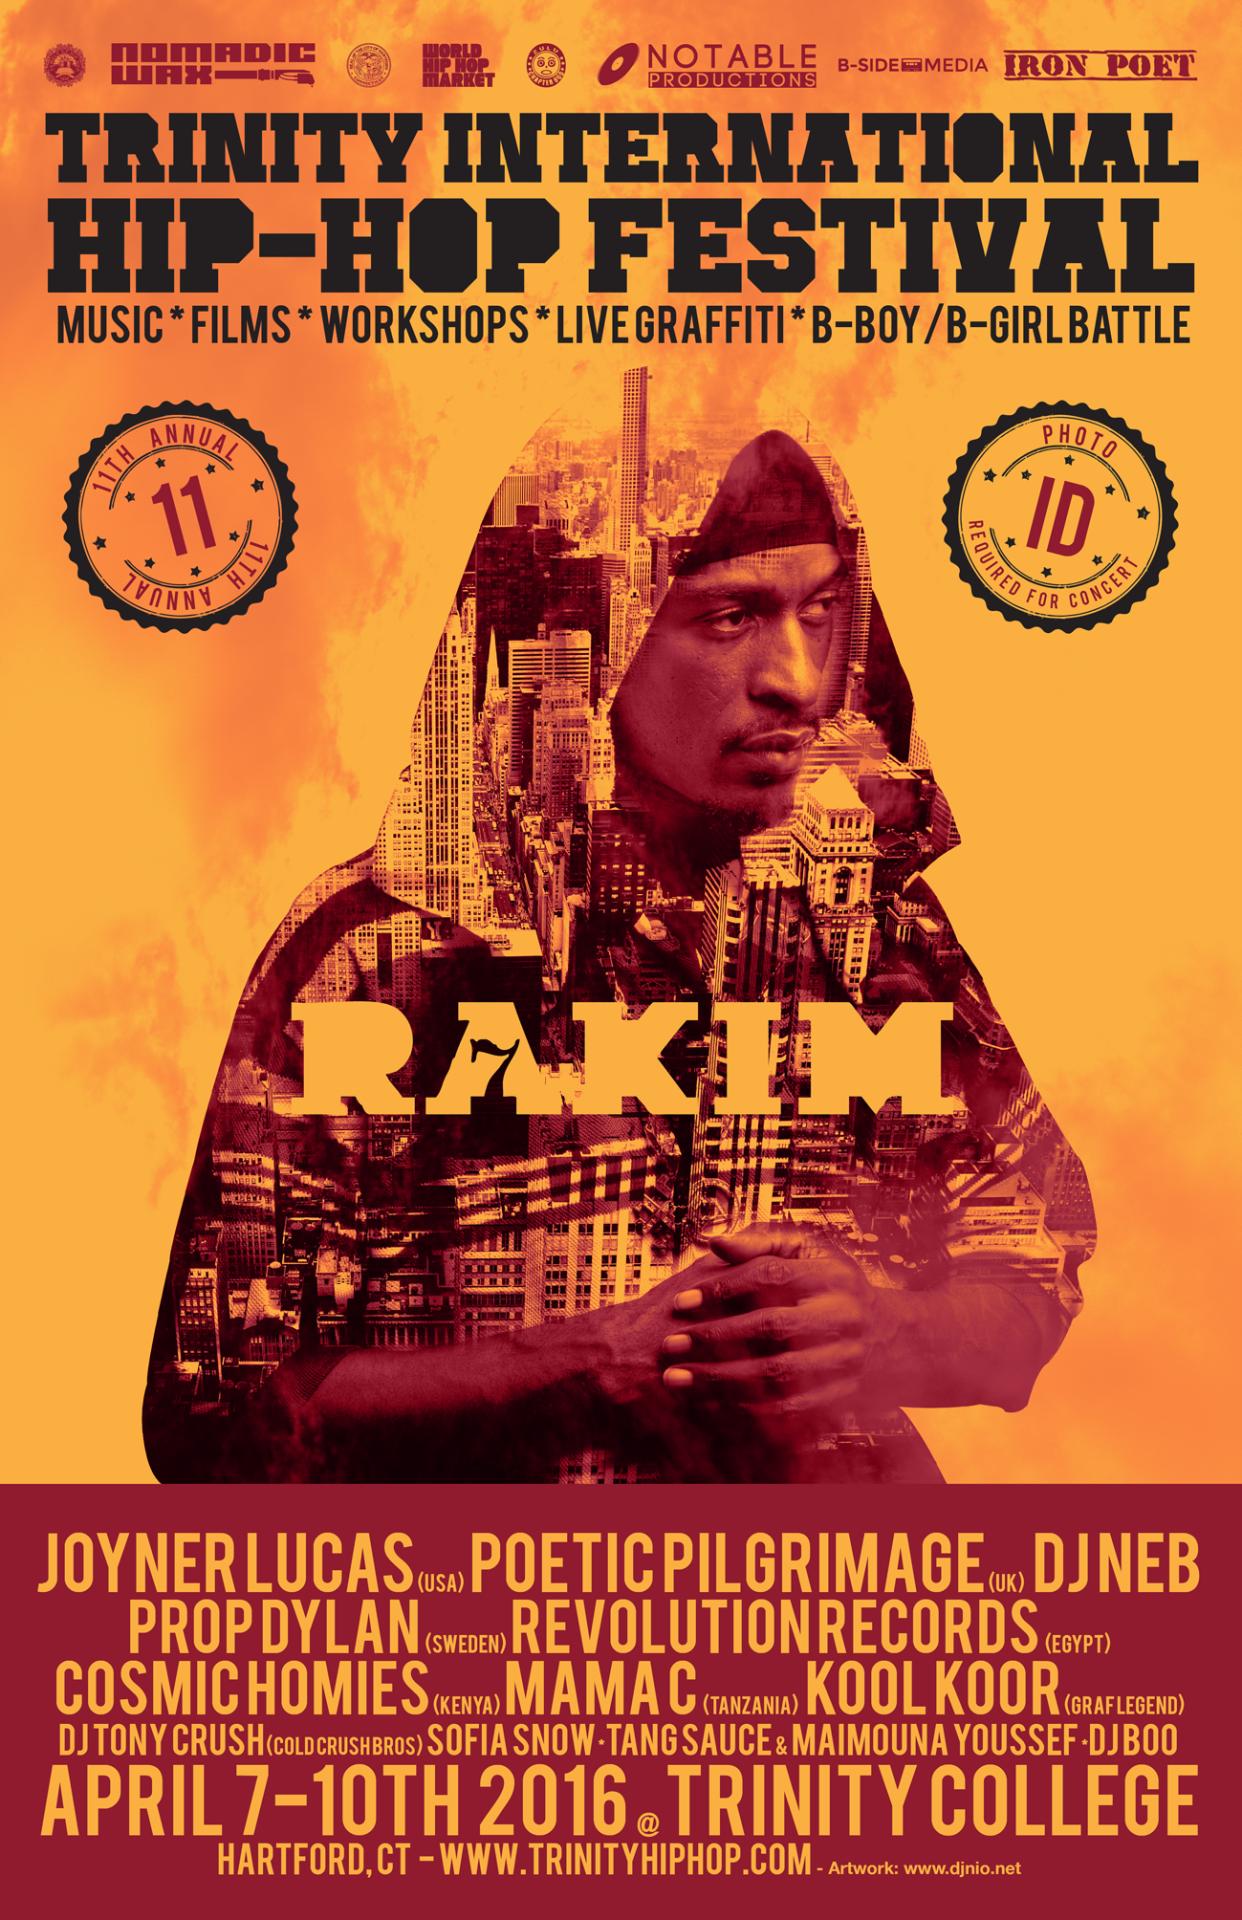 Trinity International Hip Hop Festival (U.S.A.)